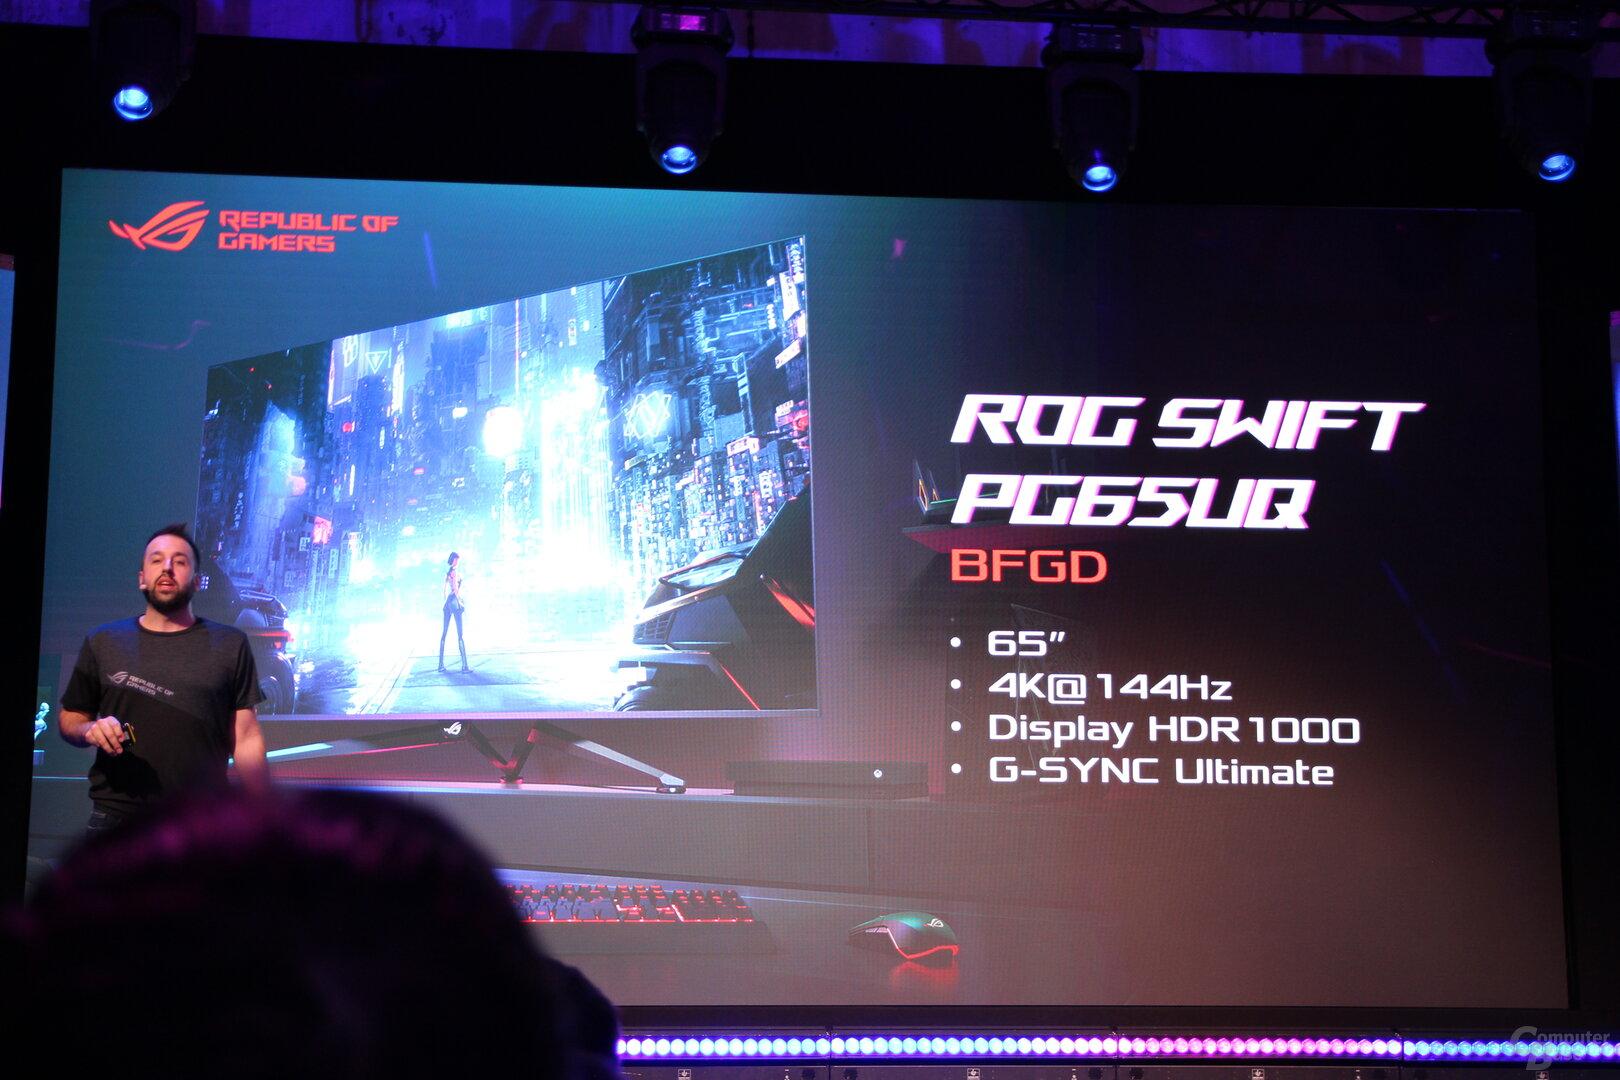 Asus ROG Swift PG65UQ